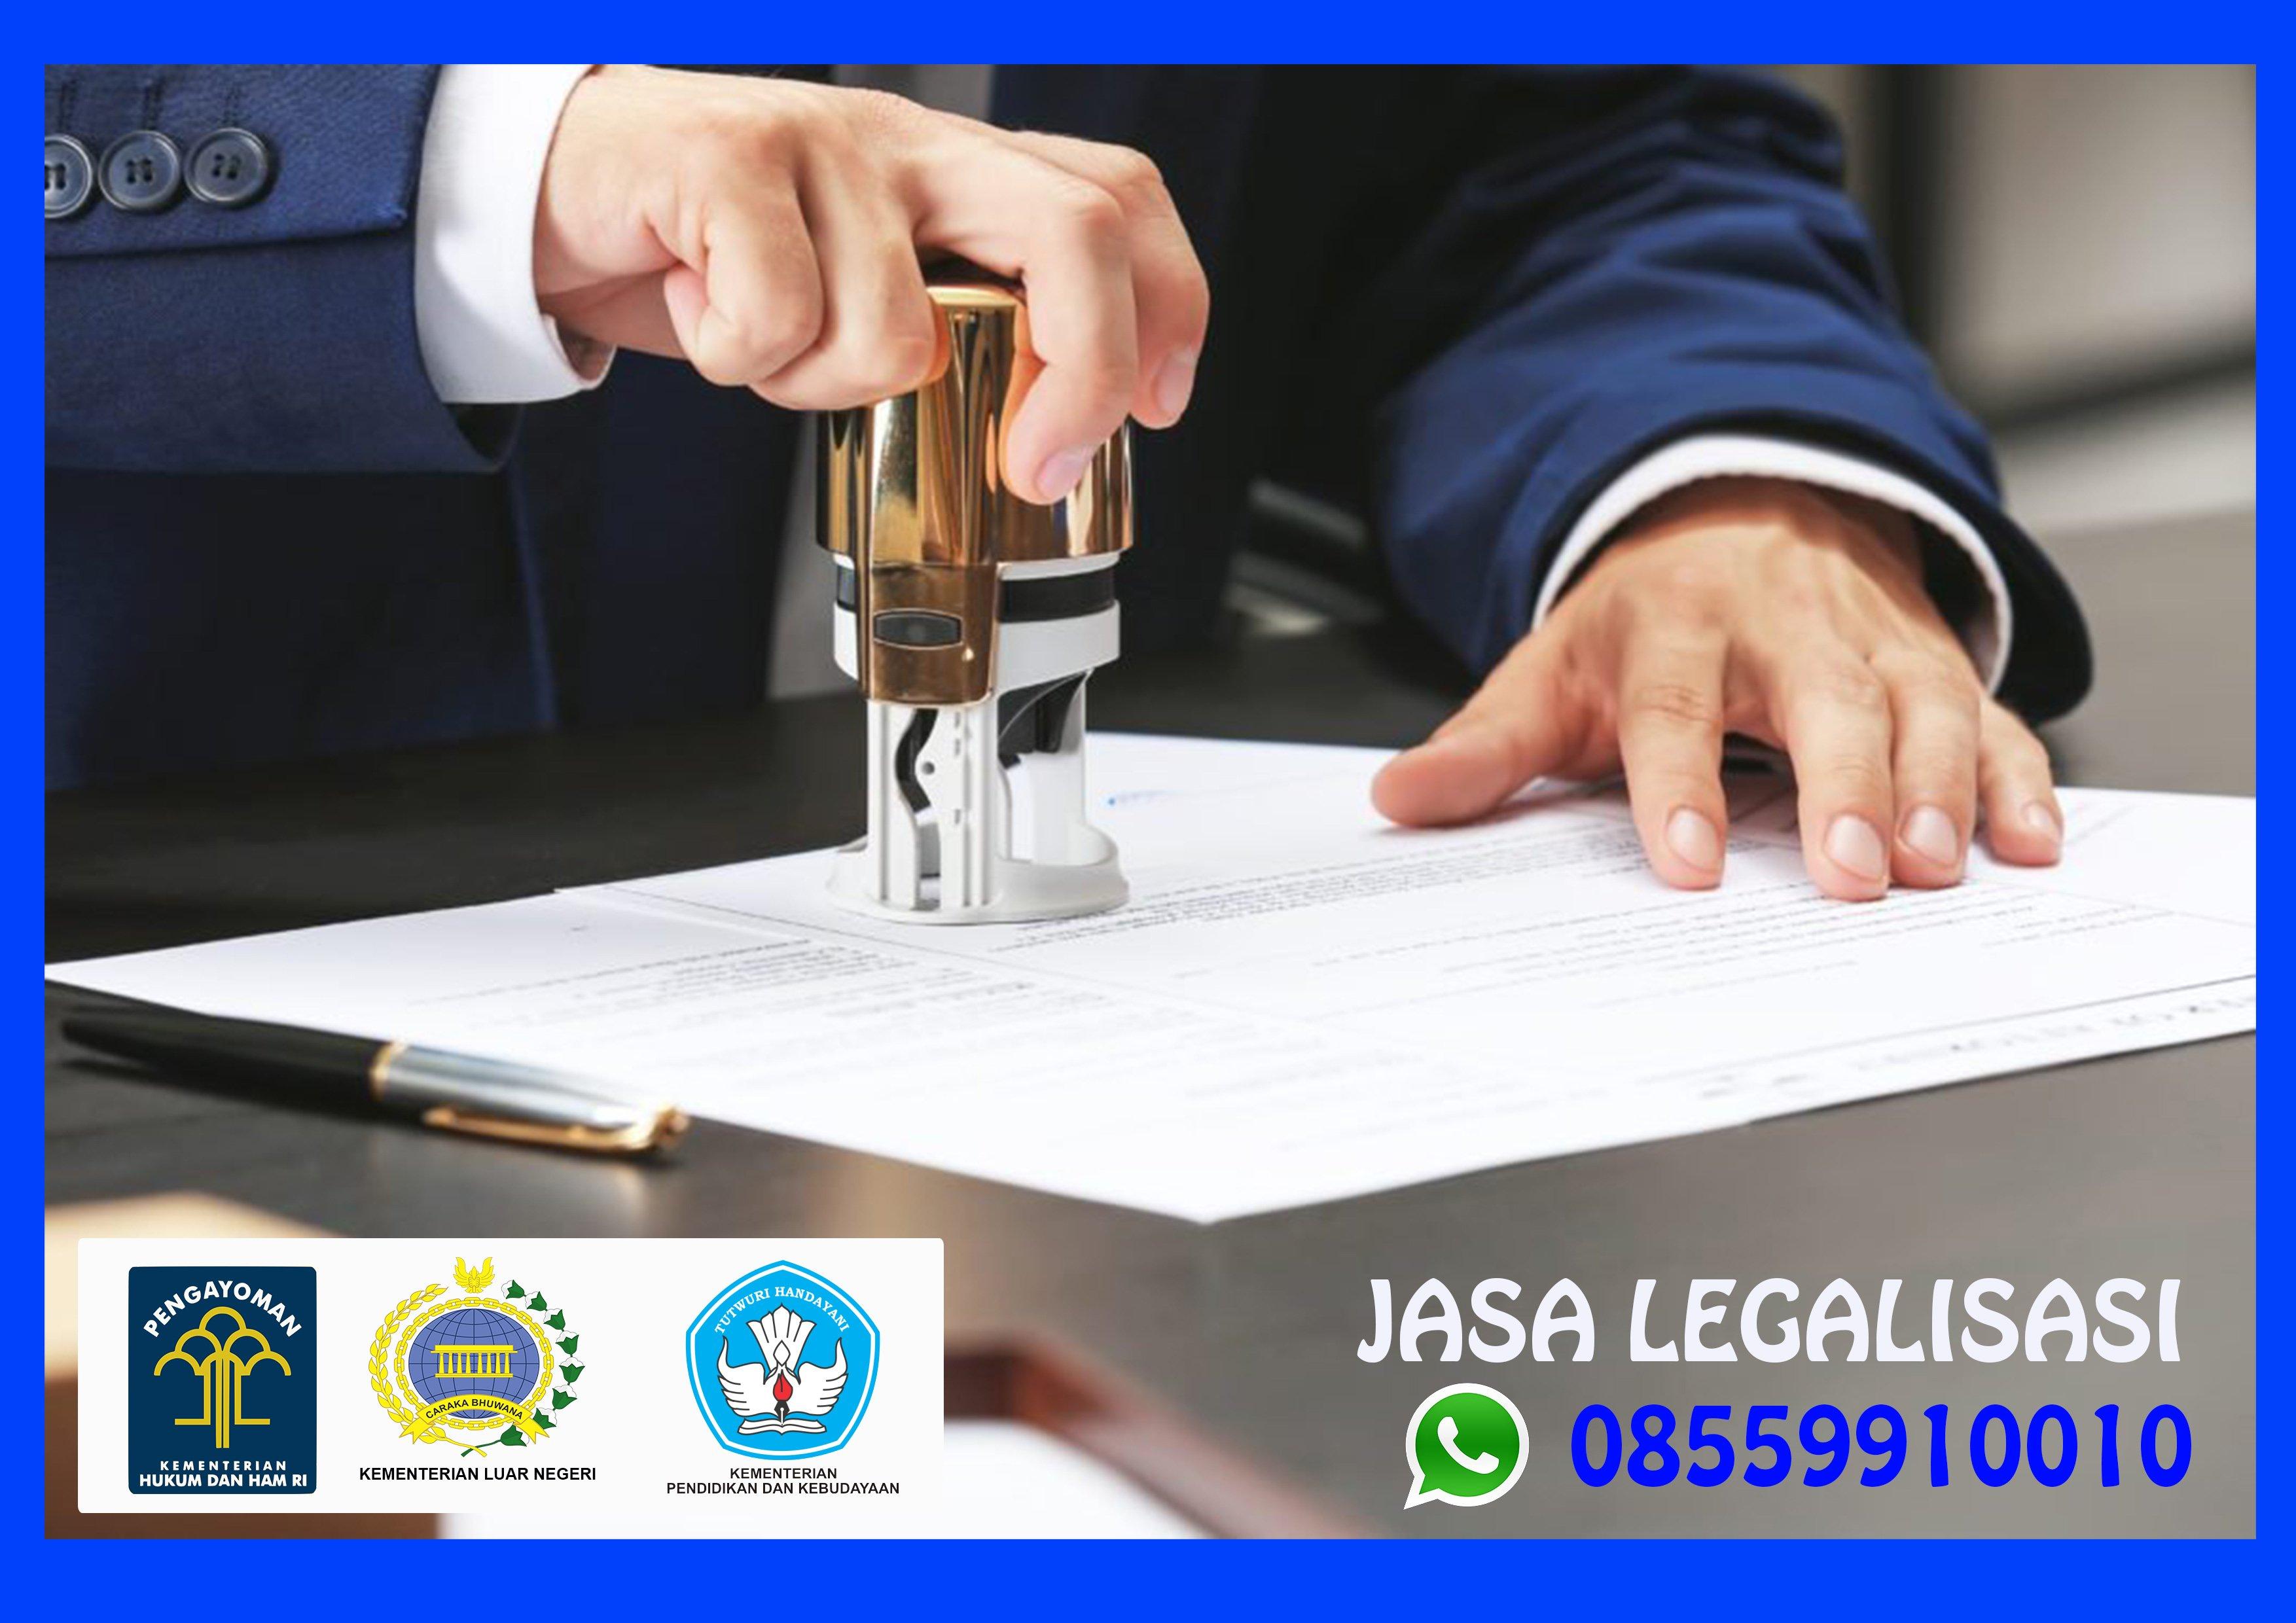 JasaLegalisir.com | Jasa Legalisasi